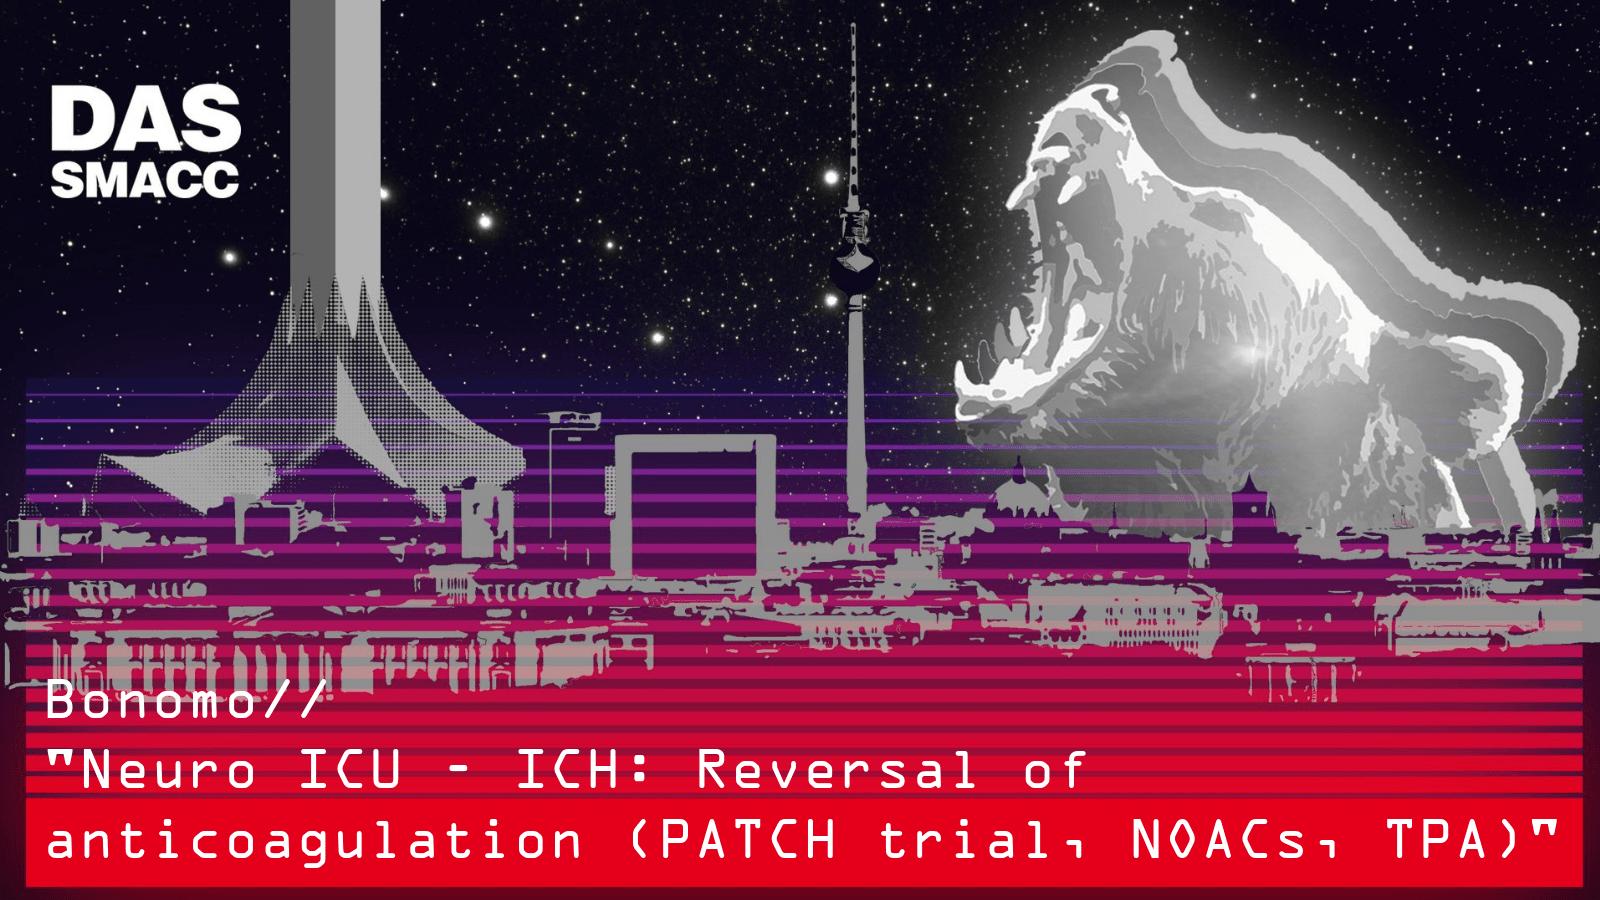 ICH: Reversal of anticoagulation (PATCH trial, NOACs, TPA)